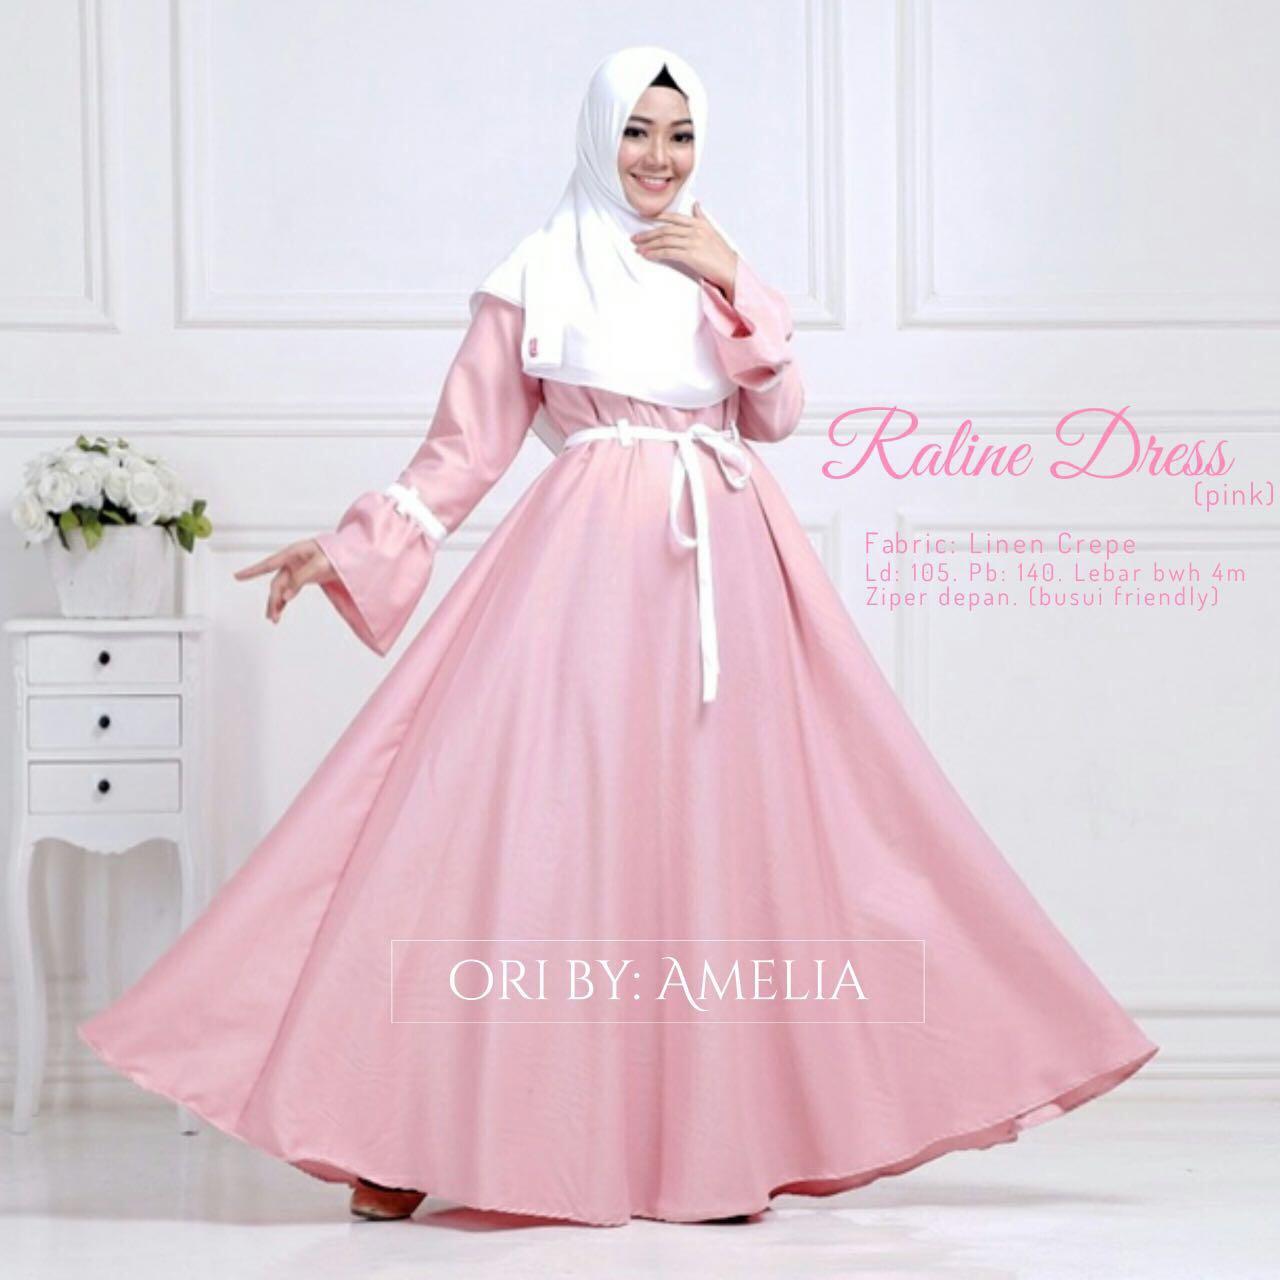 Ummiinna FashiOnline  Jual Grosir Murah Baju Muslim di Lubuklinggau 9763036ee9